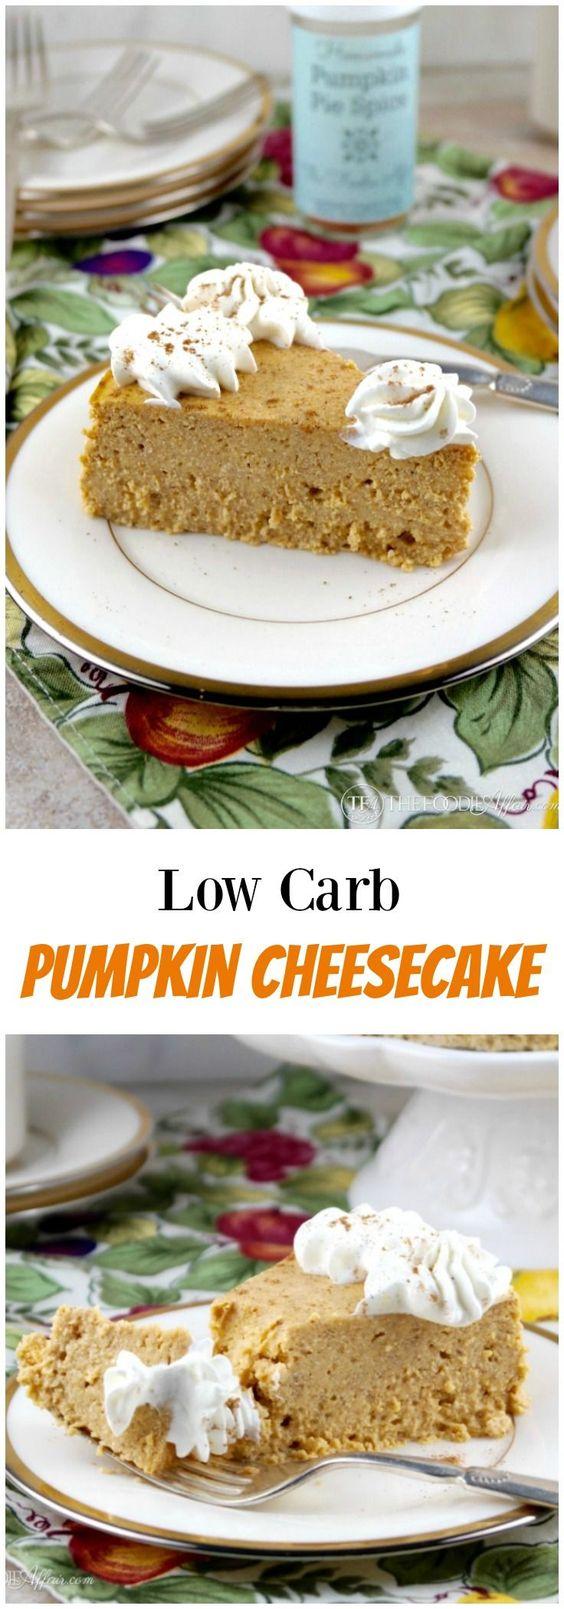 pure pumpkin cheesecake pumpkin pie cheesecake pumpkin cheesecake ...